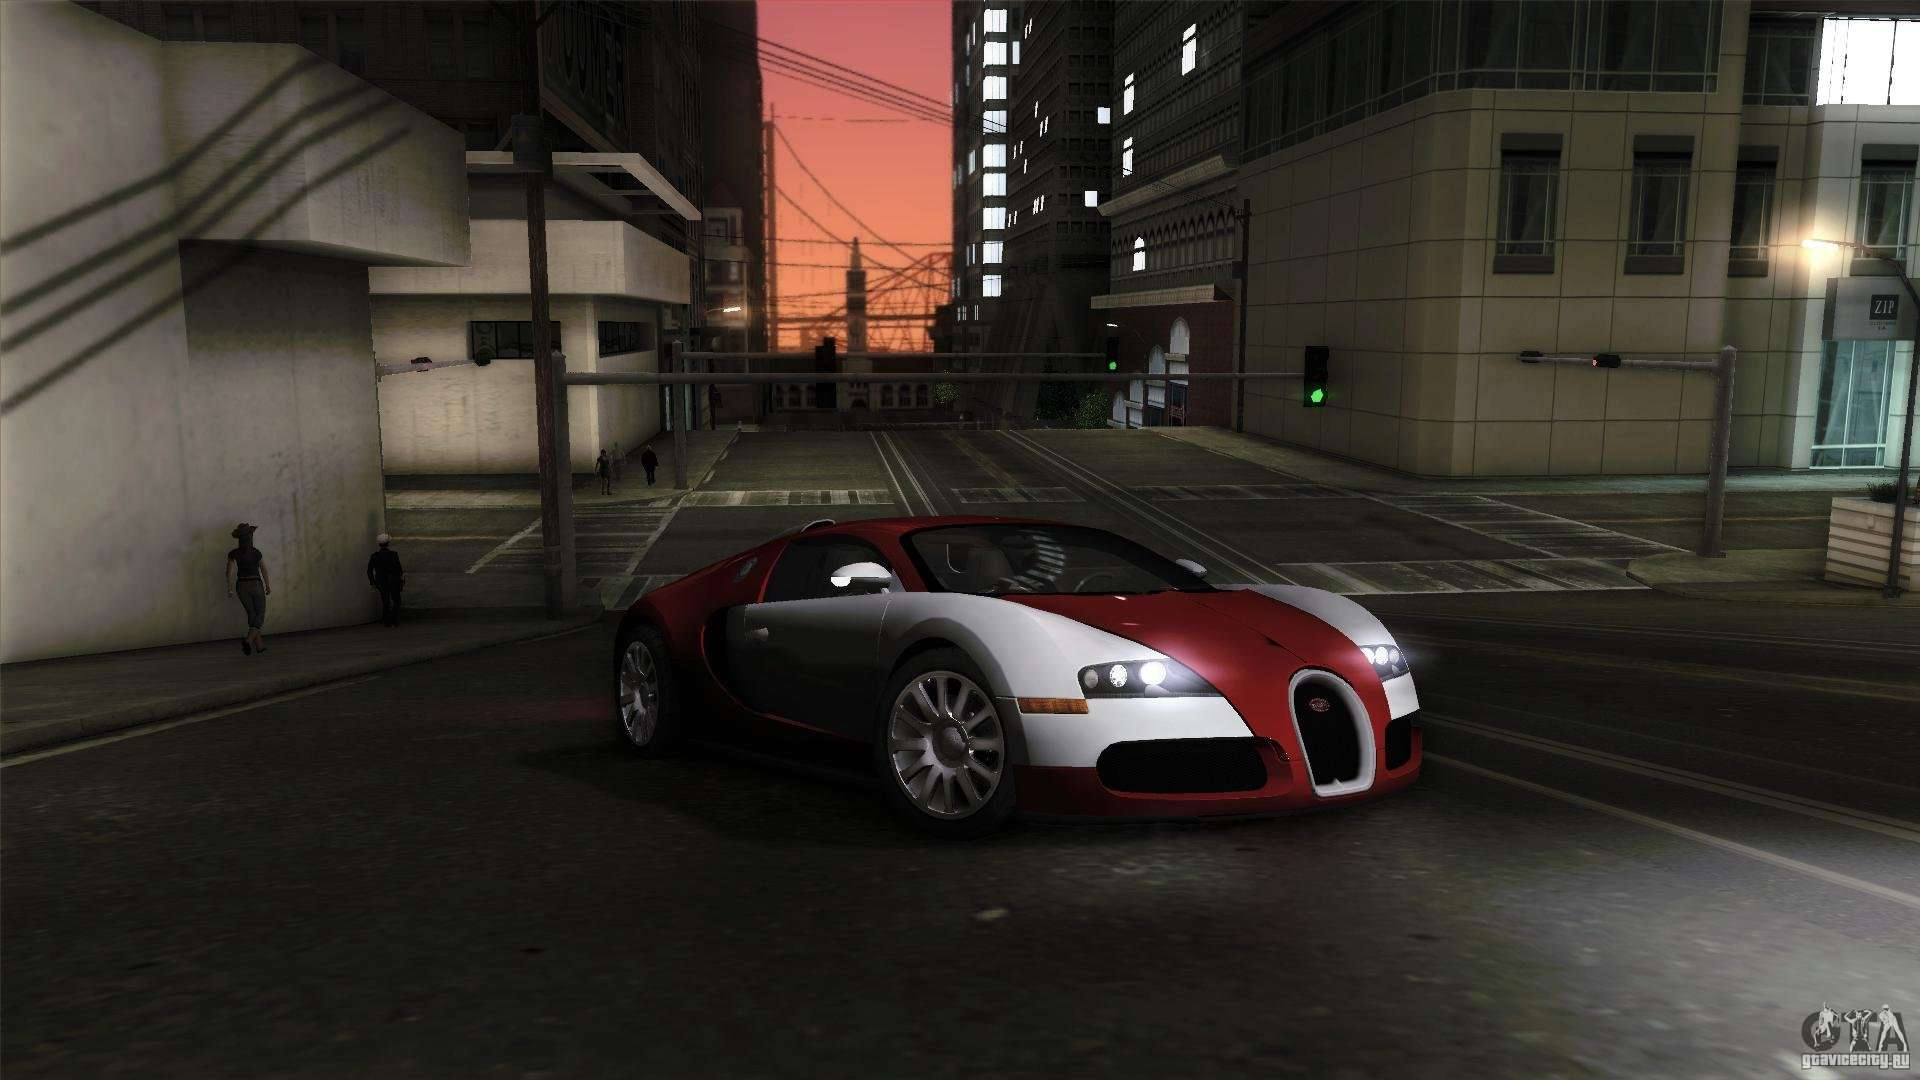 47508-1346245465-gta-sa2012-08-2916-40-44-62 Terrific Bugatti Veyron Mod Gta Sa Cars Trend